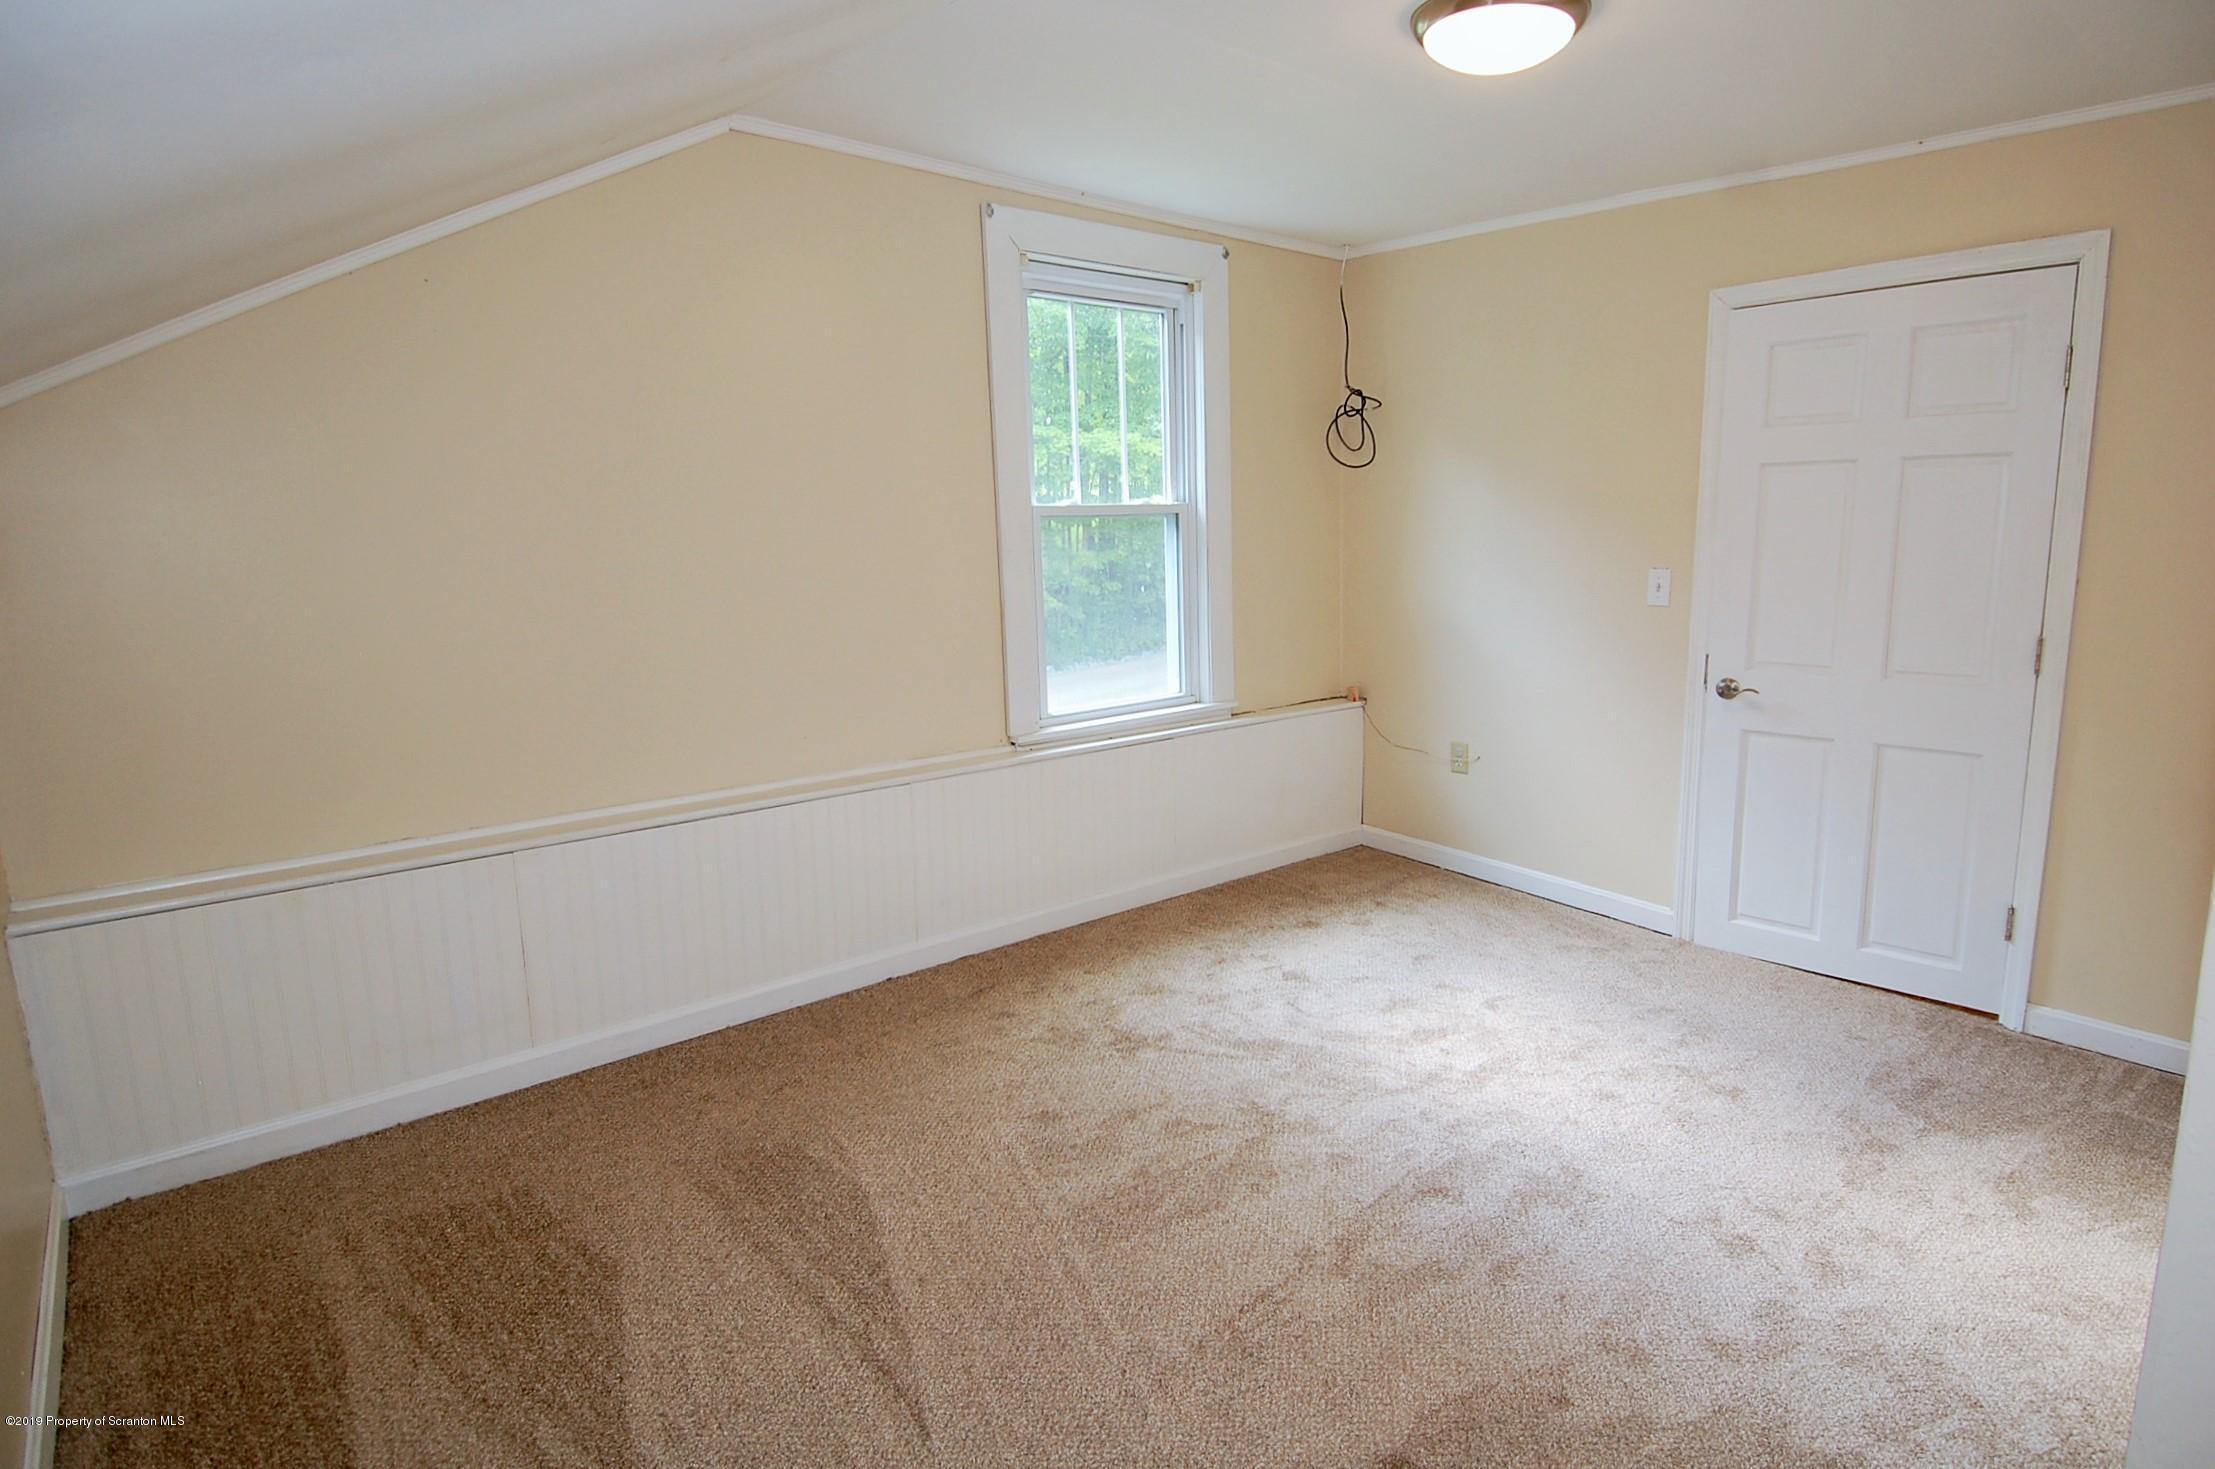 9608 North Weston Road, Kingsley, Pennsylvania 18826, 4 Bedrooms Bedrooms, 8 Rooms Rooms,2 BathroomsBathrooms,Single Family,For Sale,North Weston Road,19-3919